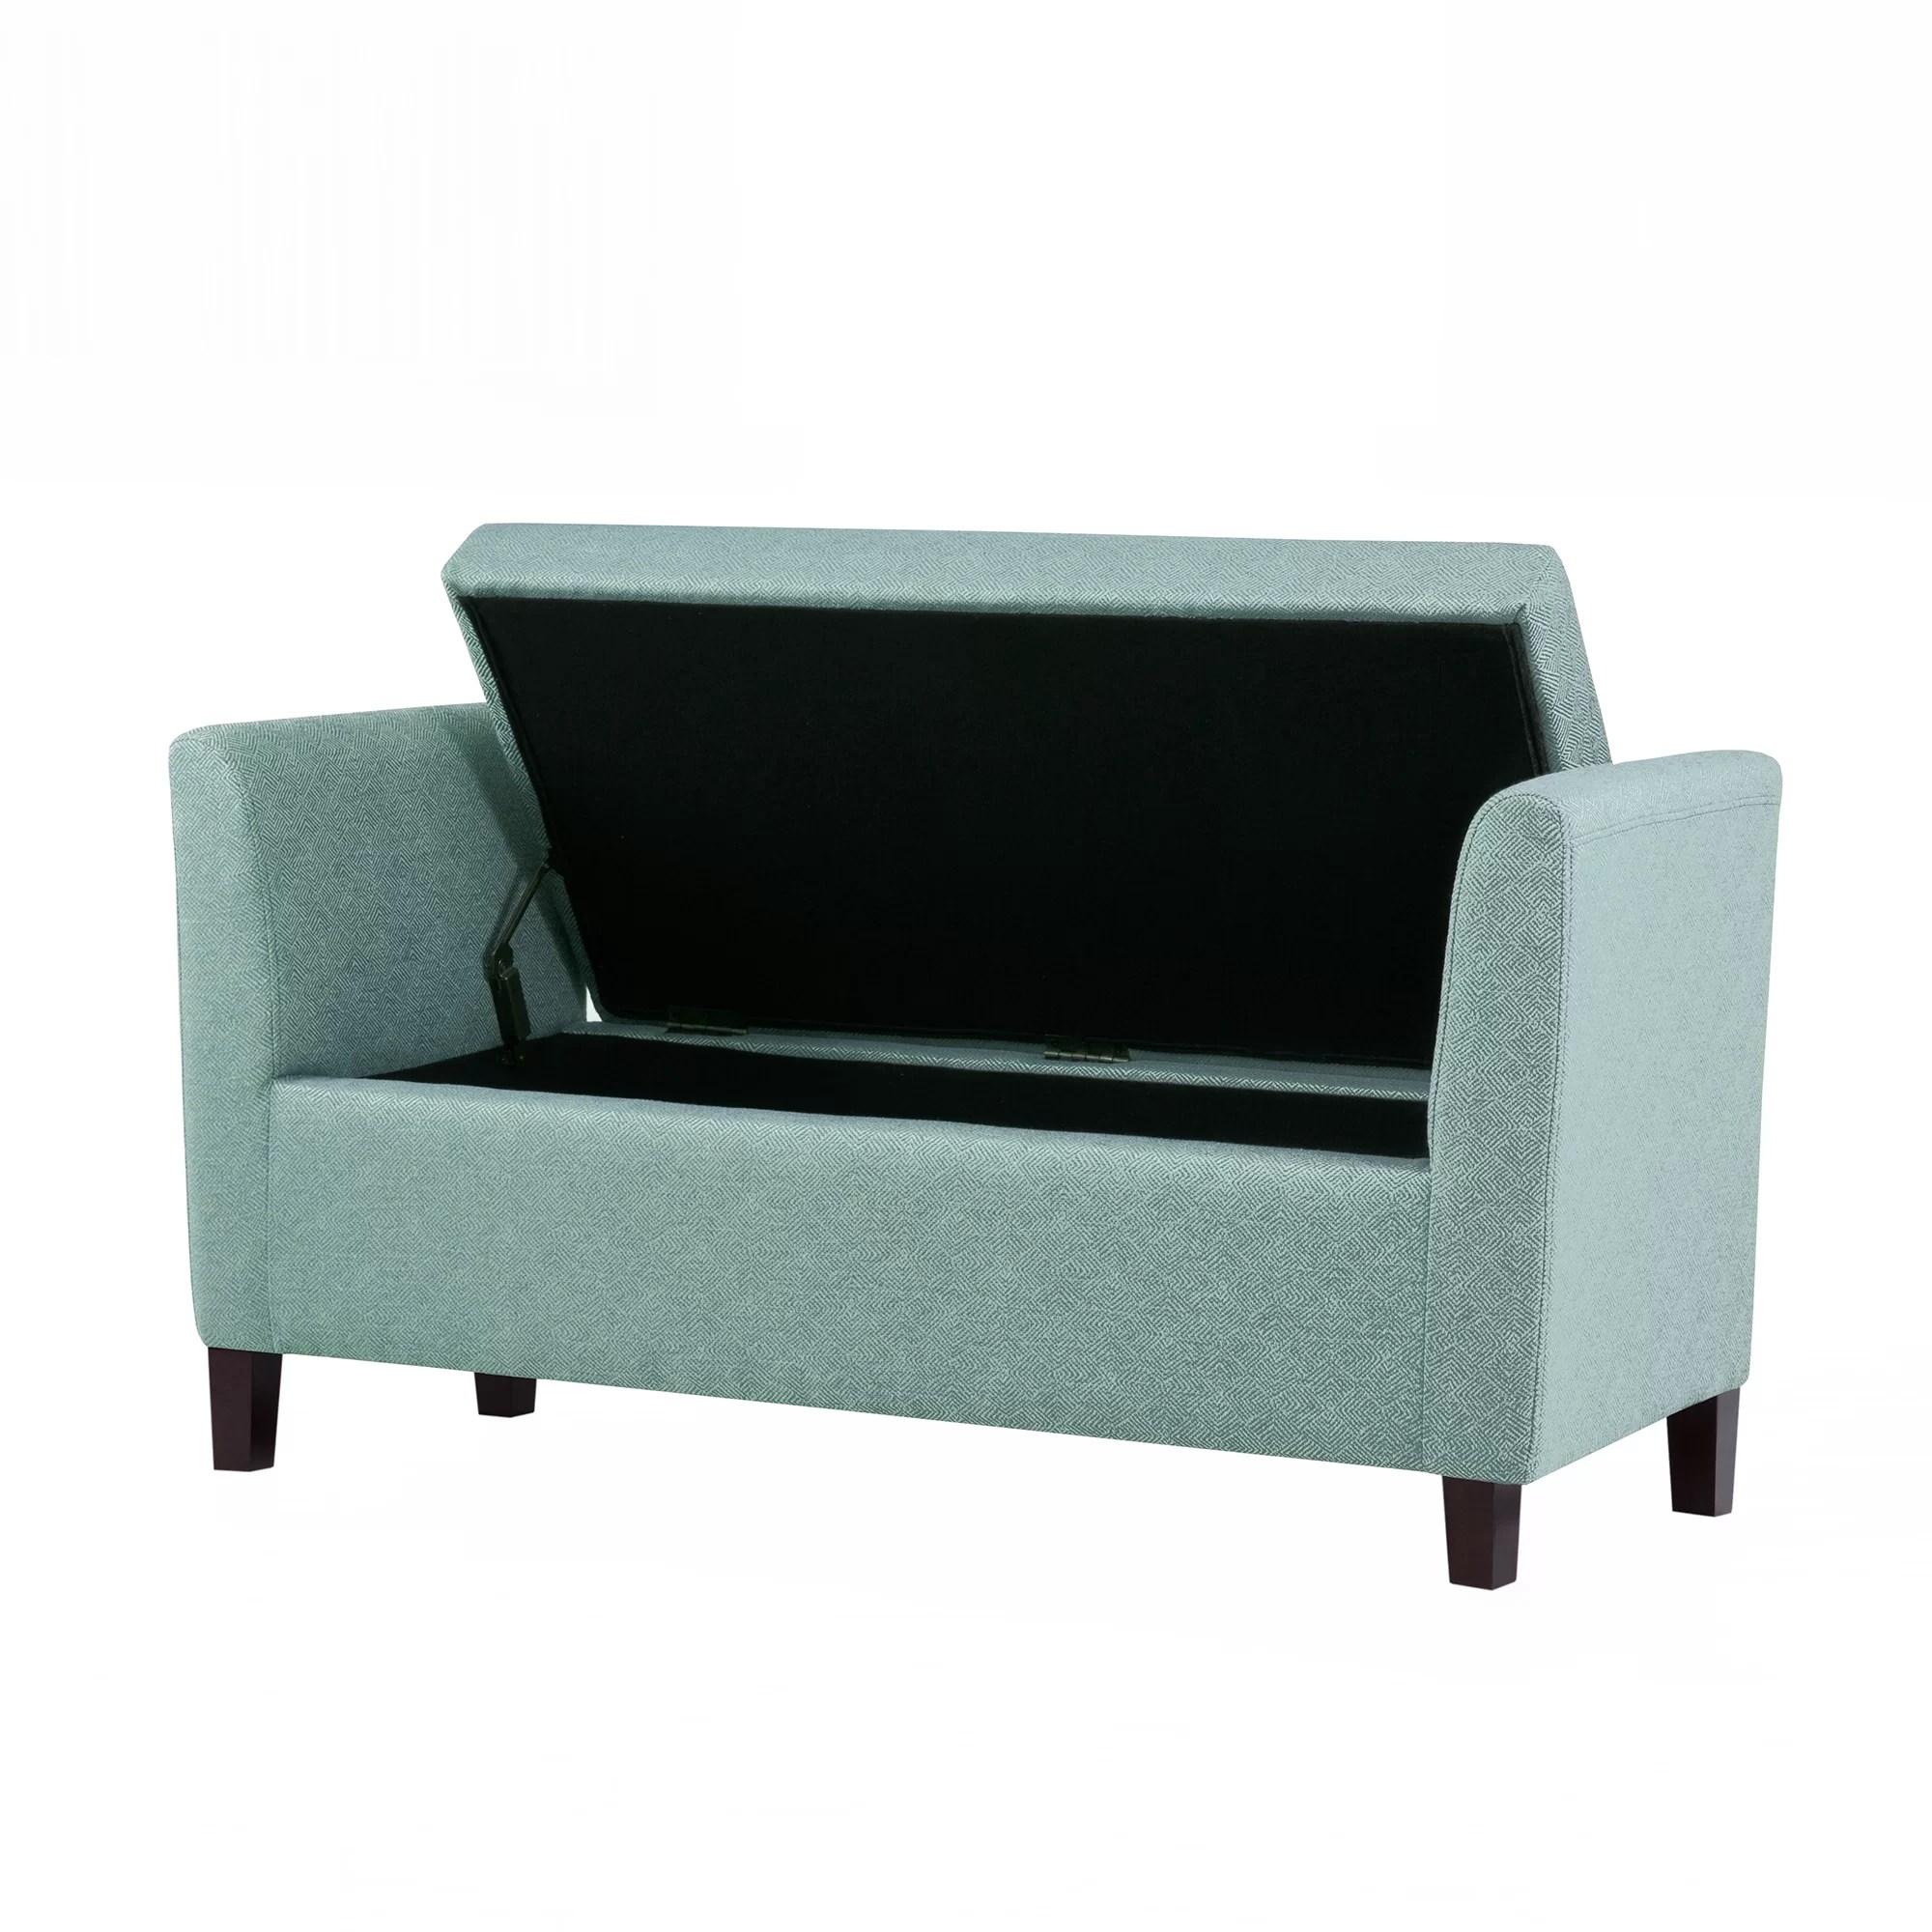 Red Barrel Studio Craig Upholstered Storage Bedroom Bench  Reviews  Wayfair